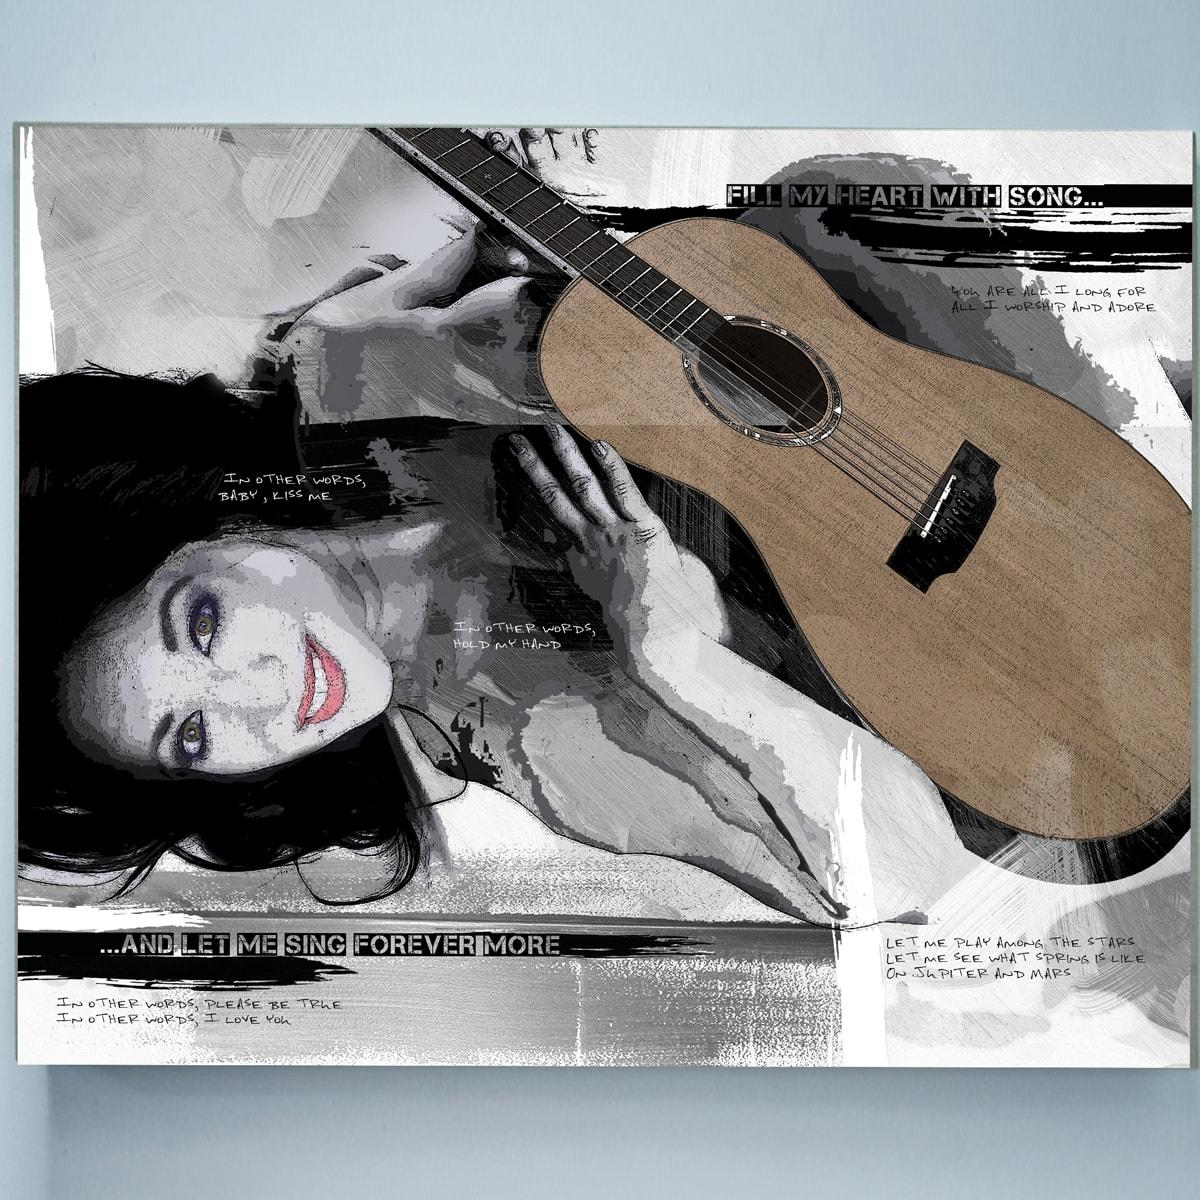 Portfolio-Fine-Art-Fly-me-to-the-moon